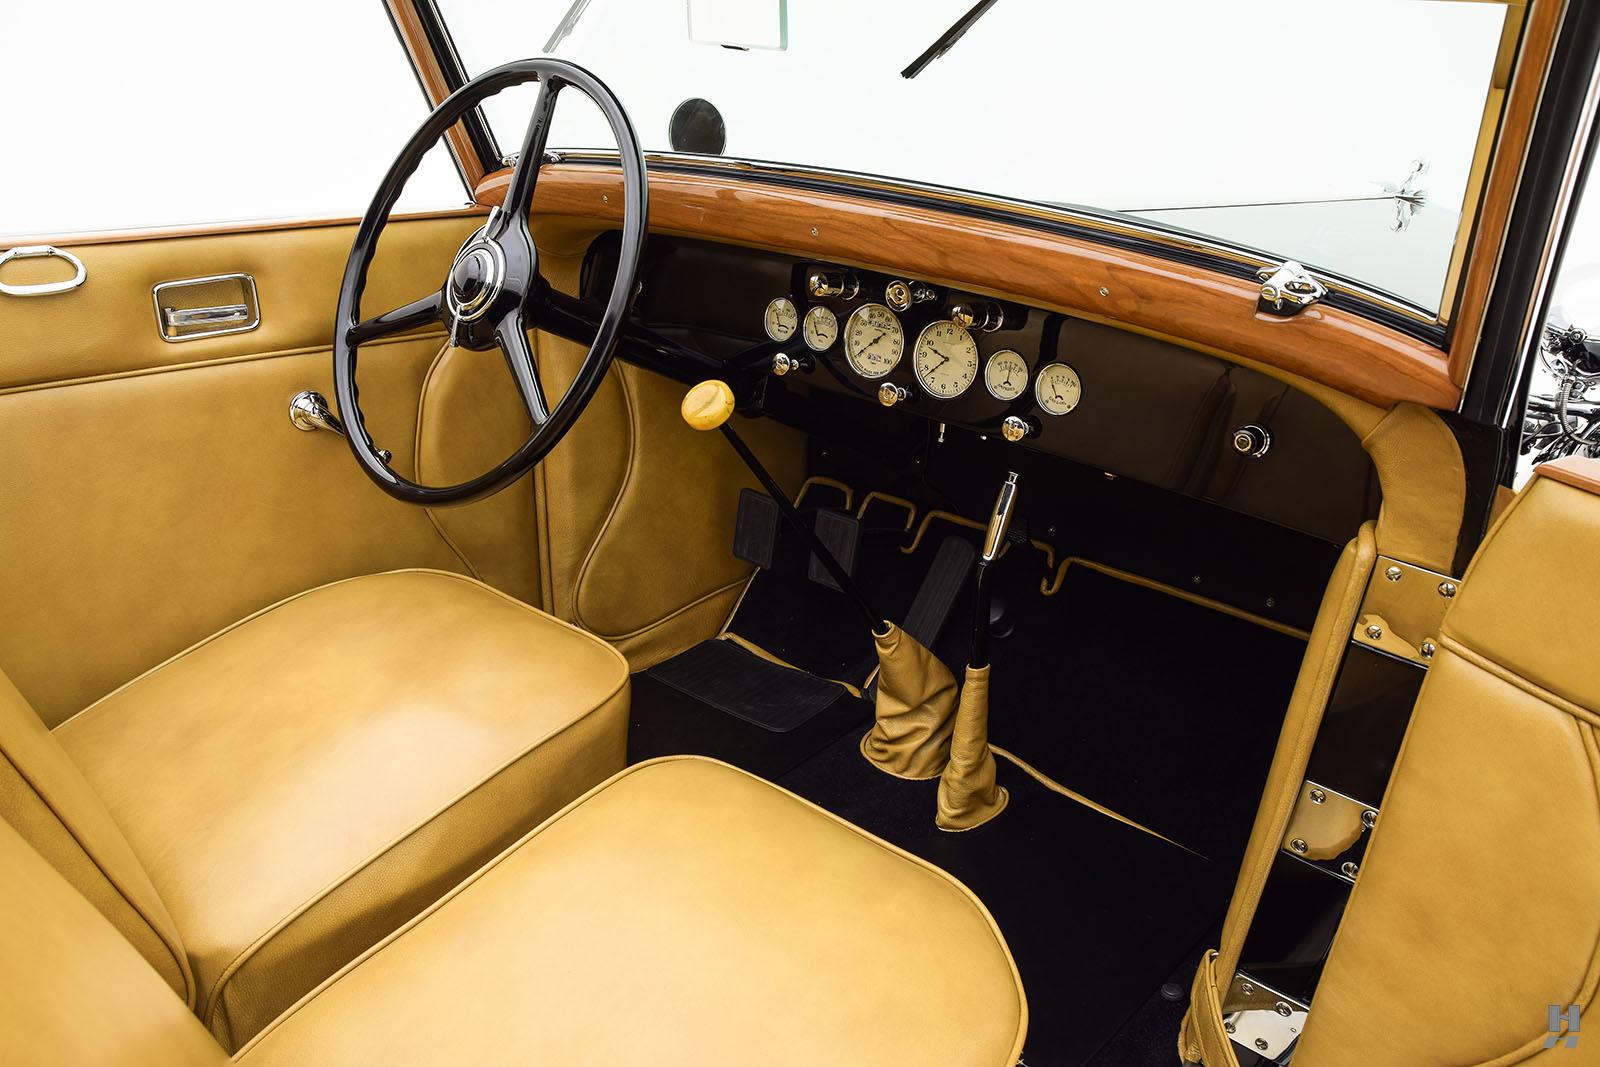 1931 Chrysler CG Imperial Waterhouse Victoria | Hyman Ltd. Classic Cars